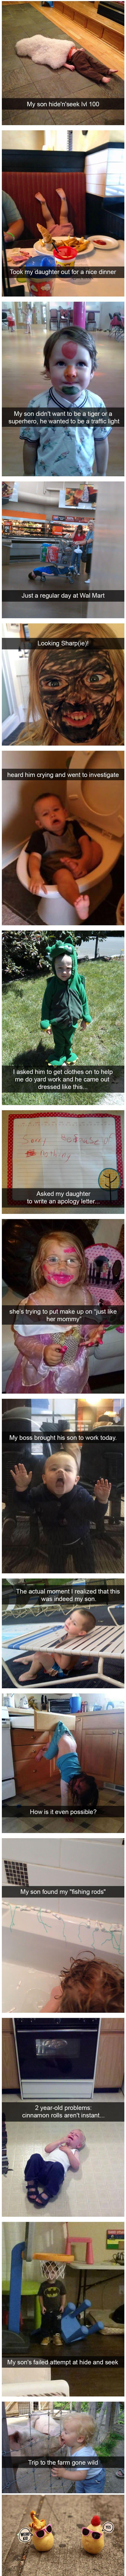 Kids Are Complete Weirdos